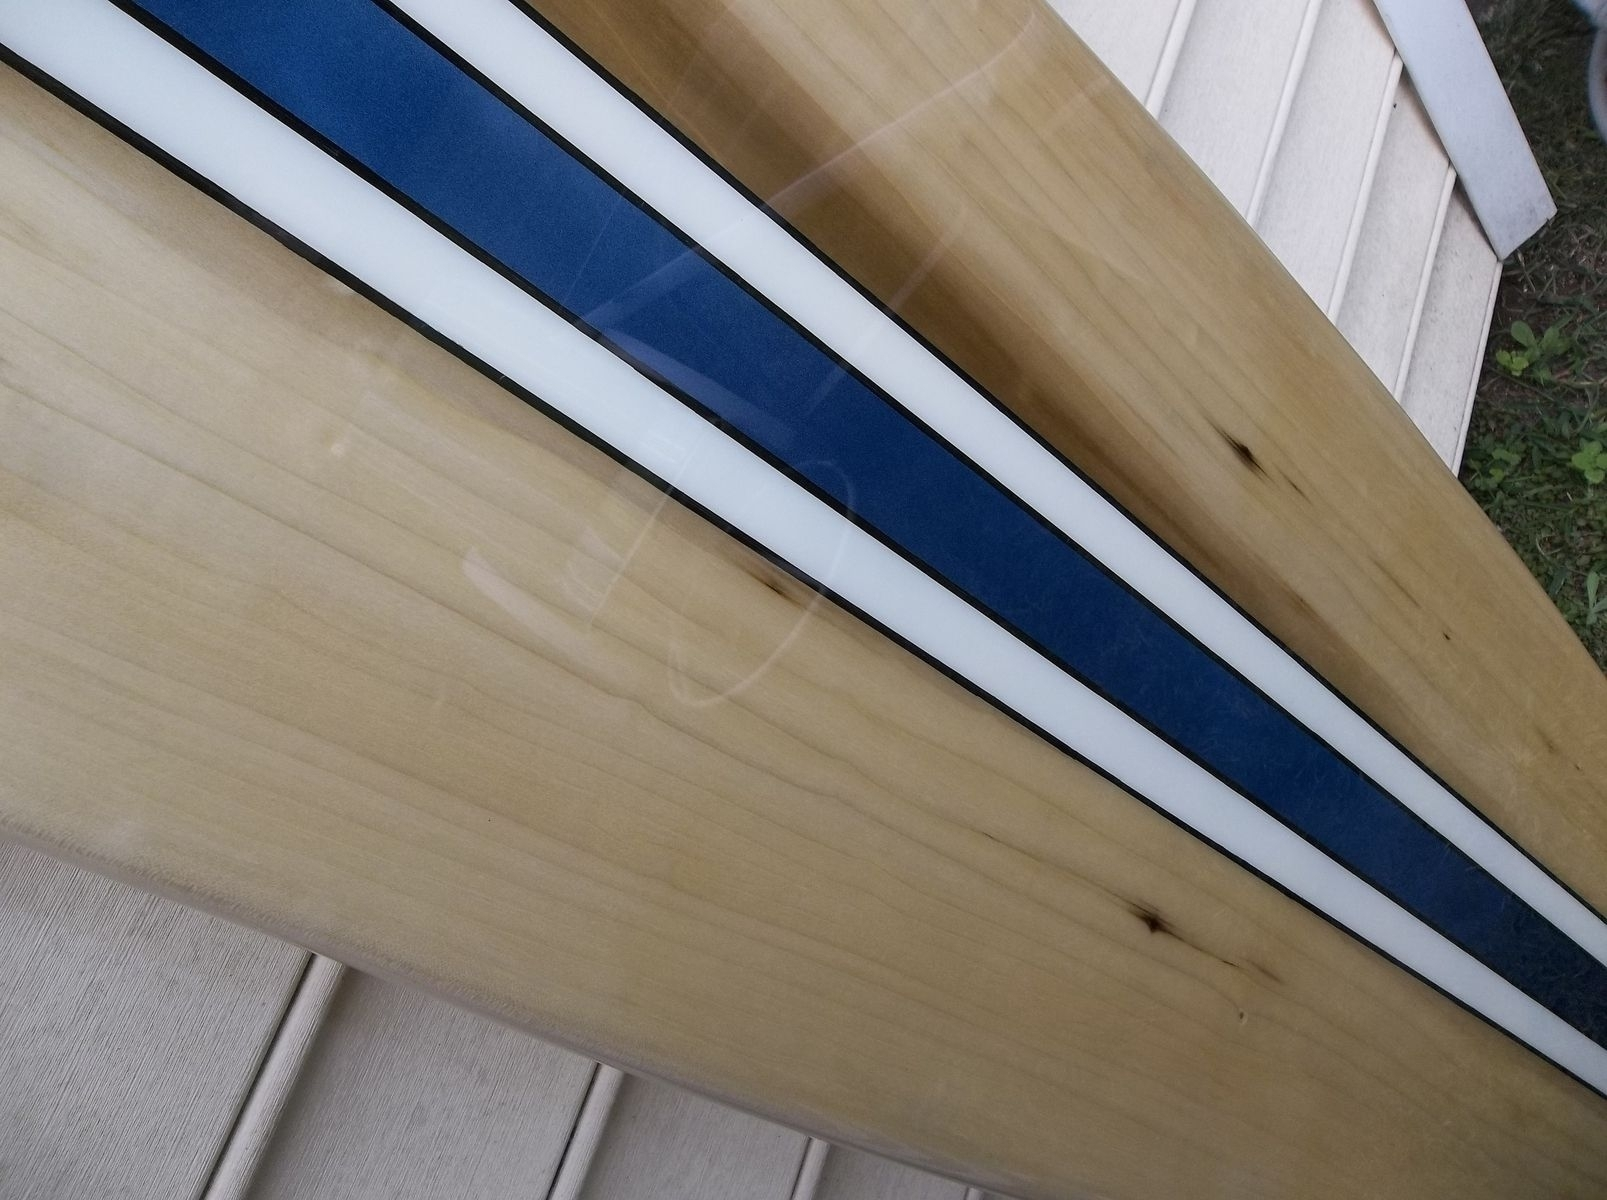 Hand Made Surfboard Wall Hangings, Surfboard Wall Artflyone In Surfboard Wall Art (View 5 of 20)